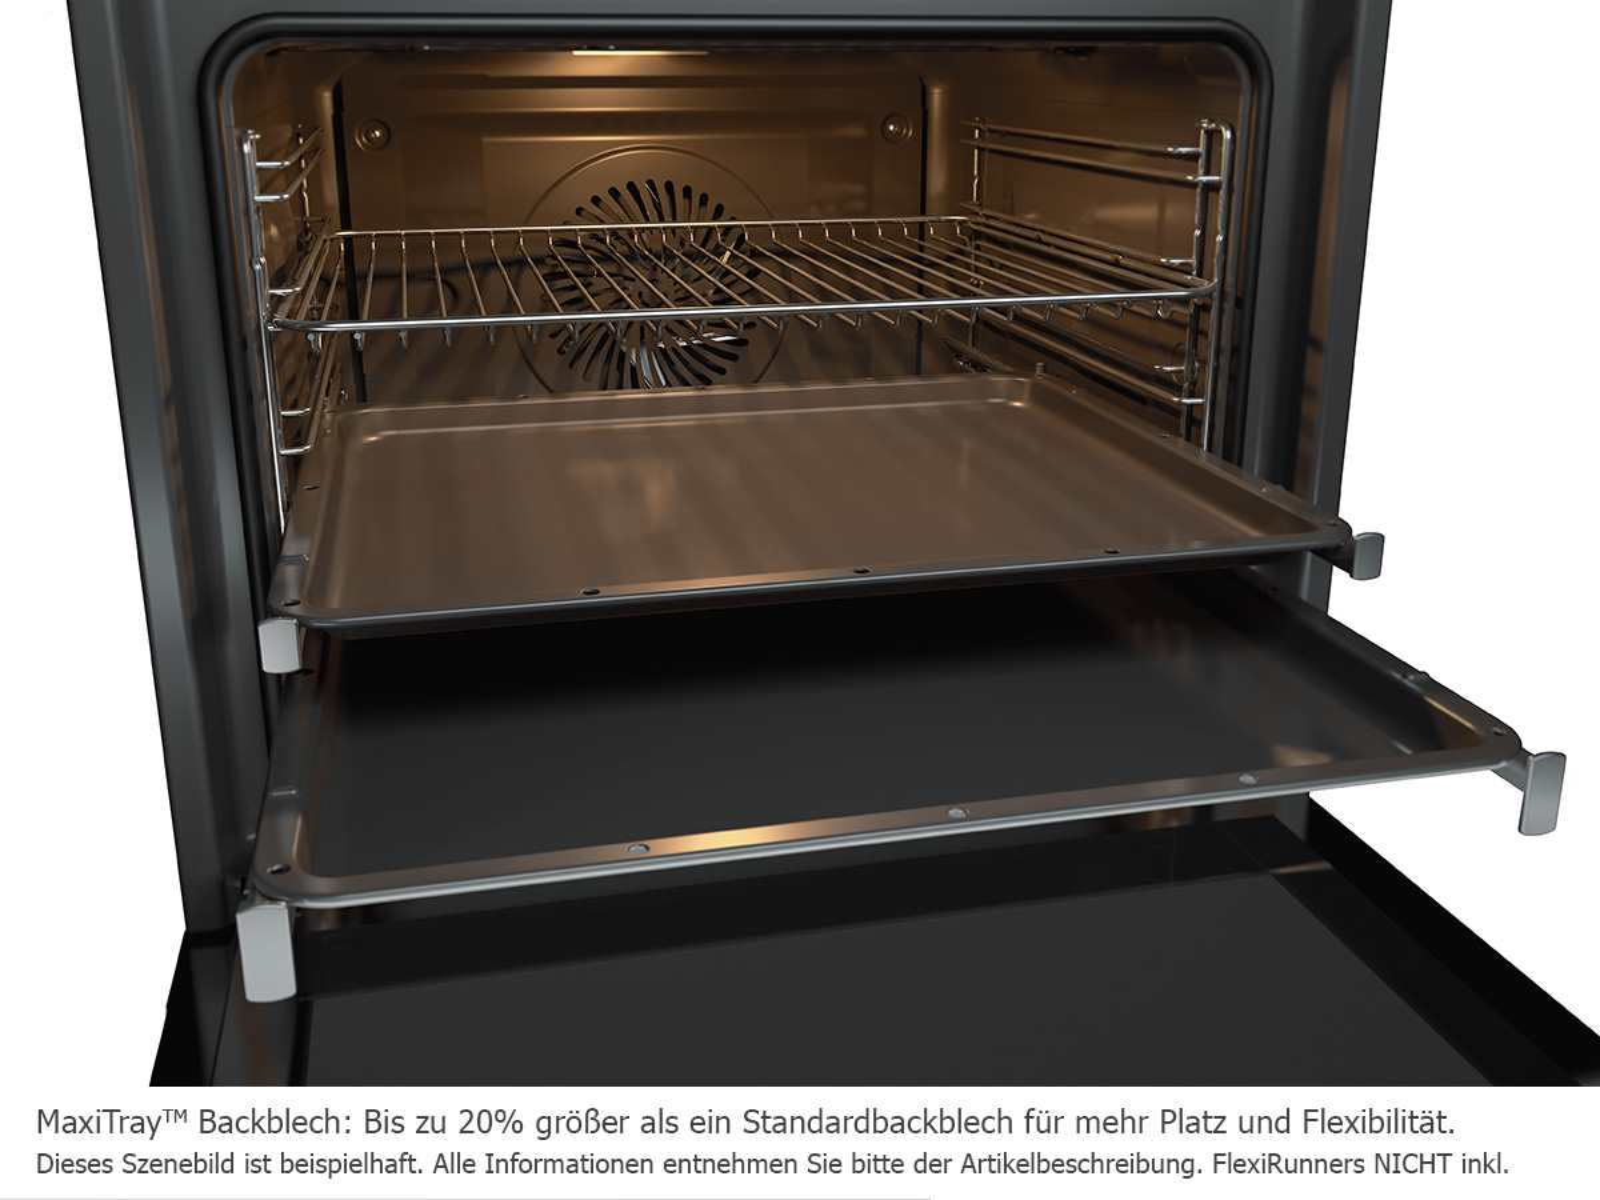 aeg bs9304701m procombi multi dampfgarer edelstahl dampf backofen einbaubackofen ebay. Black Bedroom Furniture Sets. Home Design Ideas